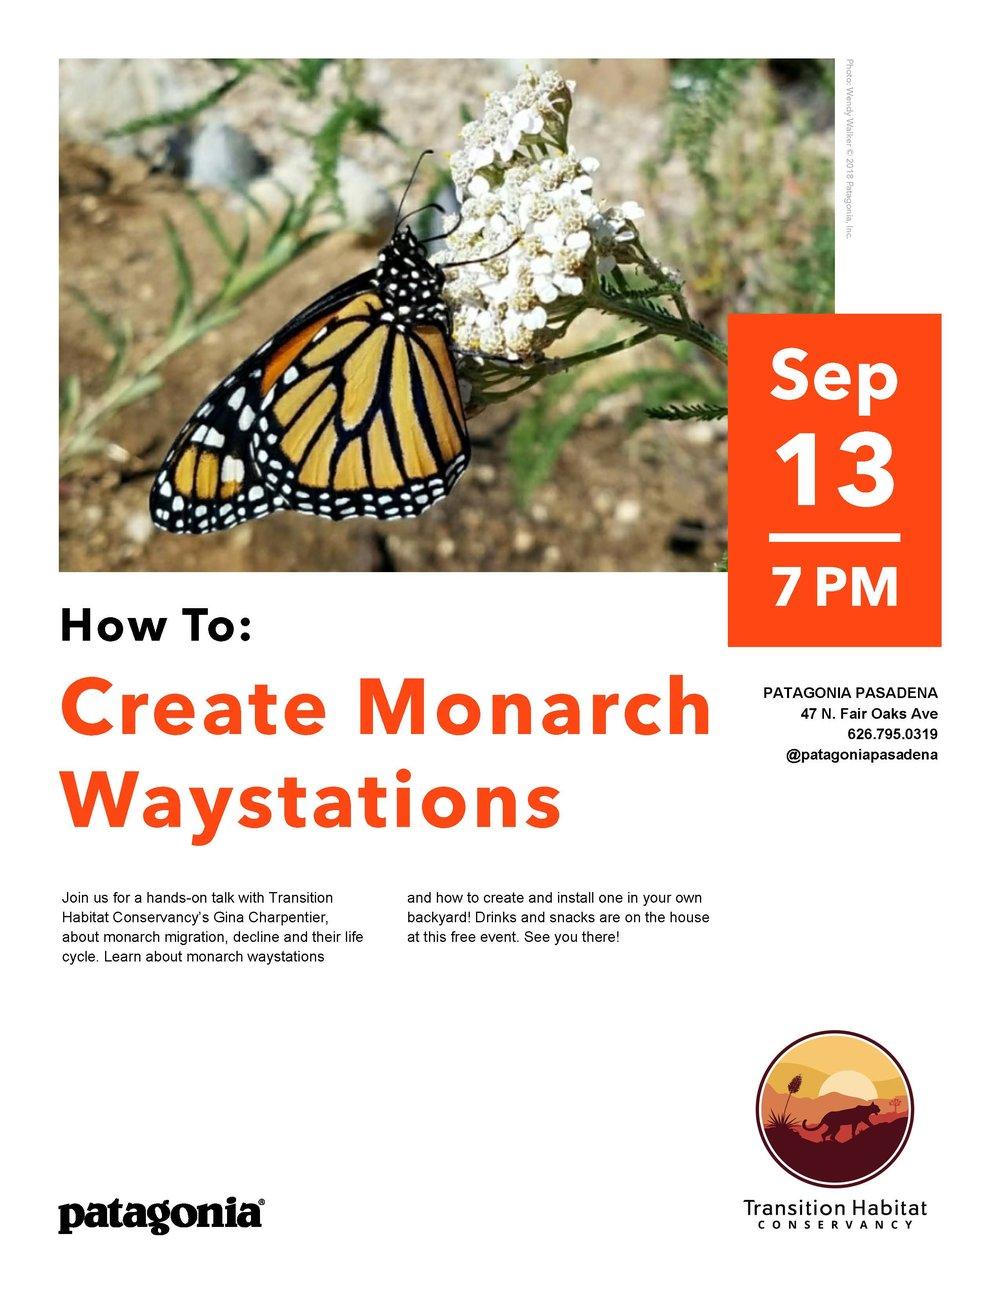 PAT_Pasadena_Monarchs_Flyer.jpg